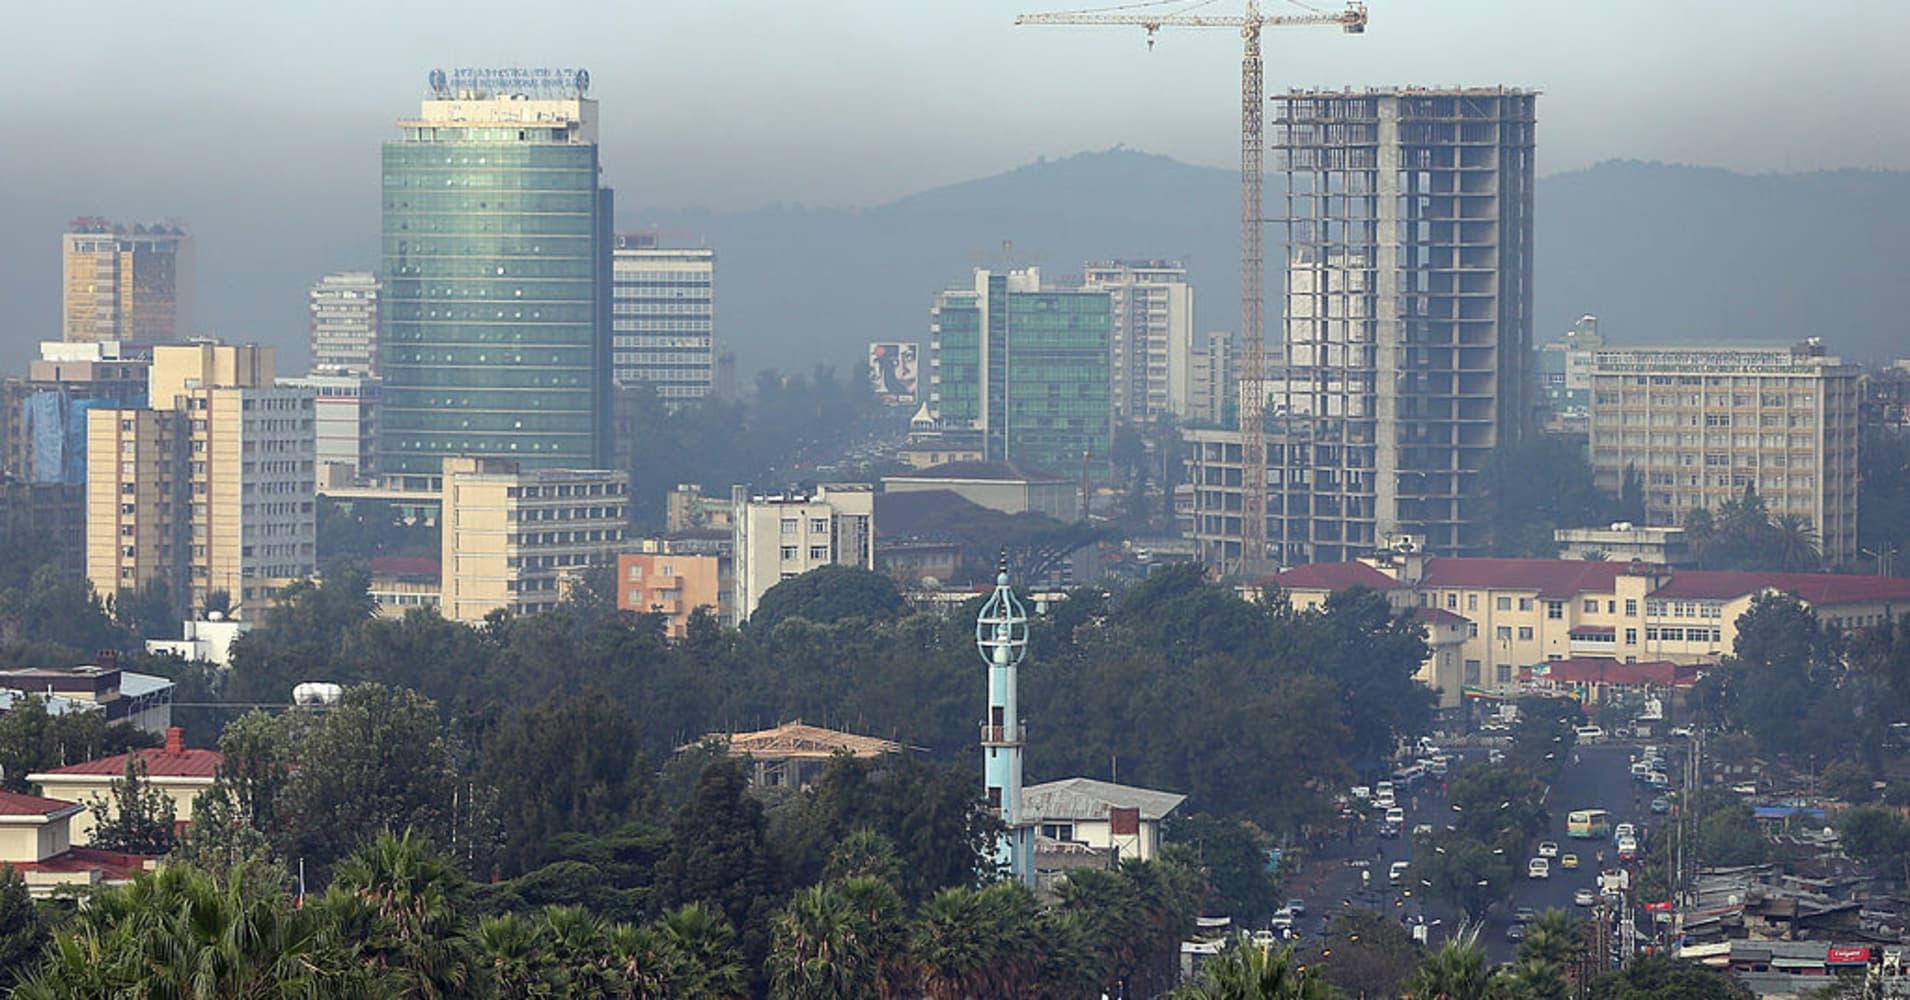 GE looks to develop renewable energy skills in Ethiopia